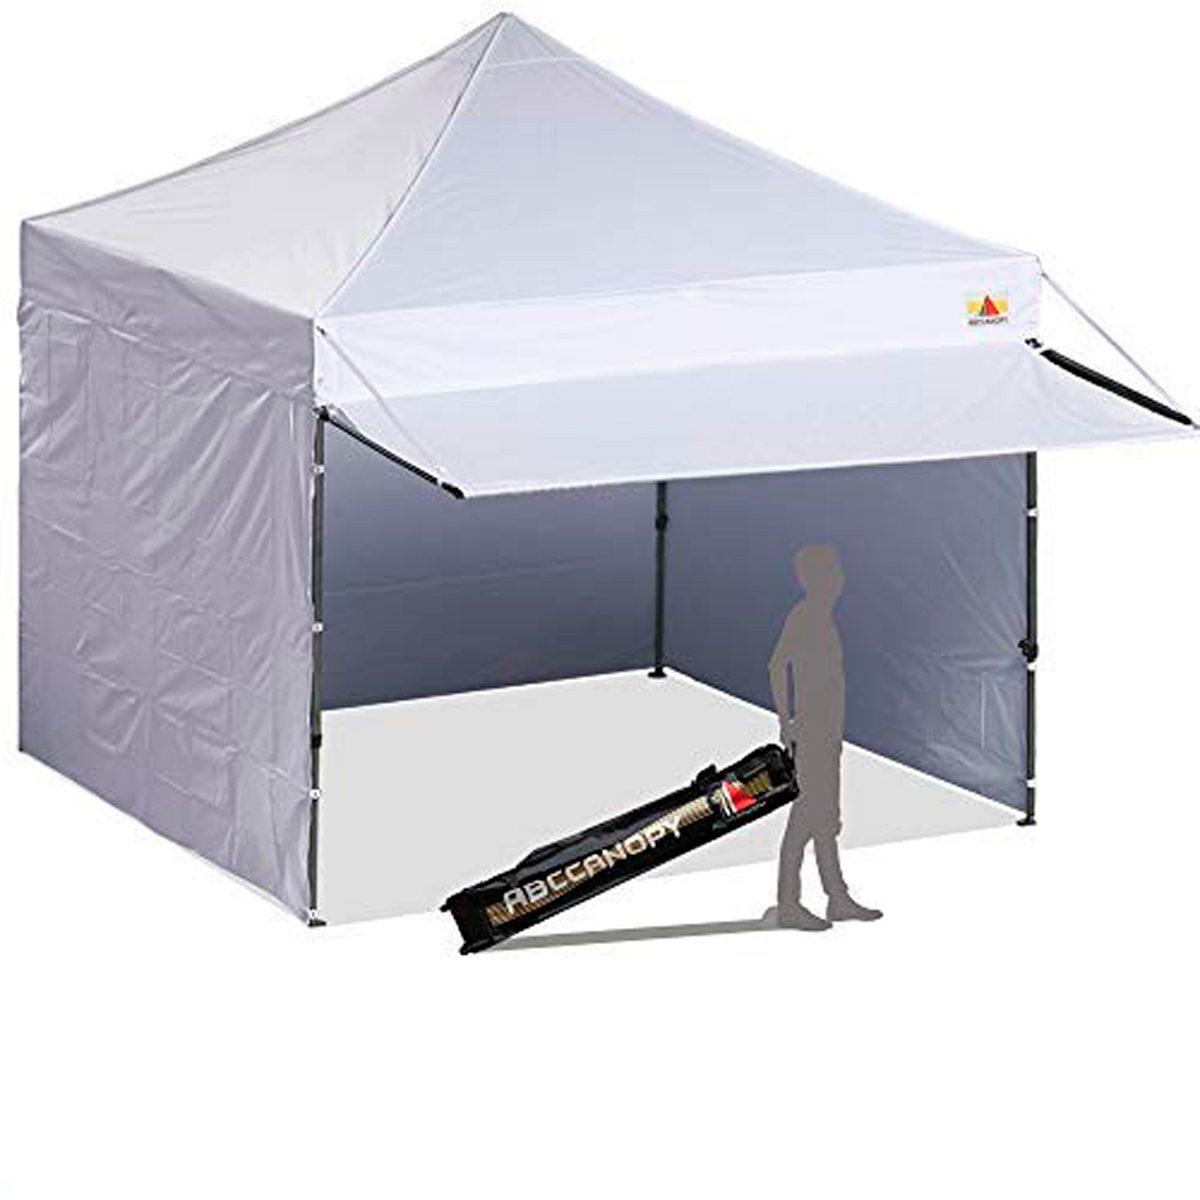 the latest dbd89 bb992 The Top 10 Portable Canopies on Amazon | Family Handyman